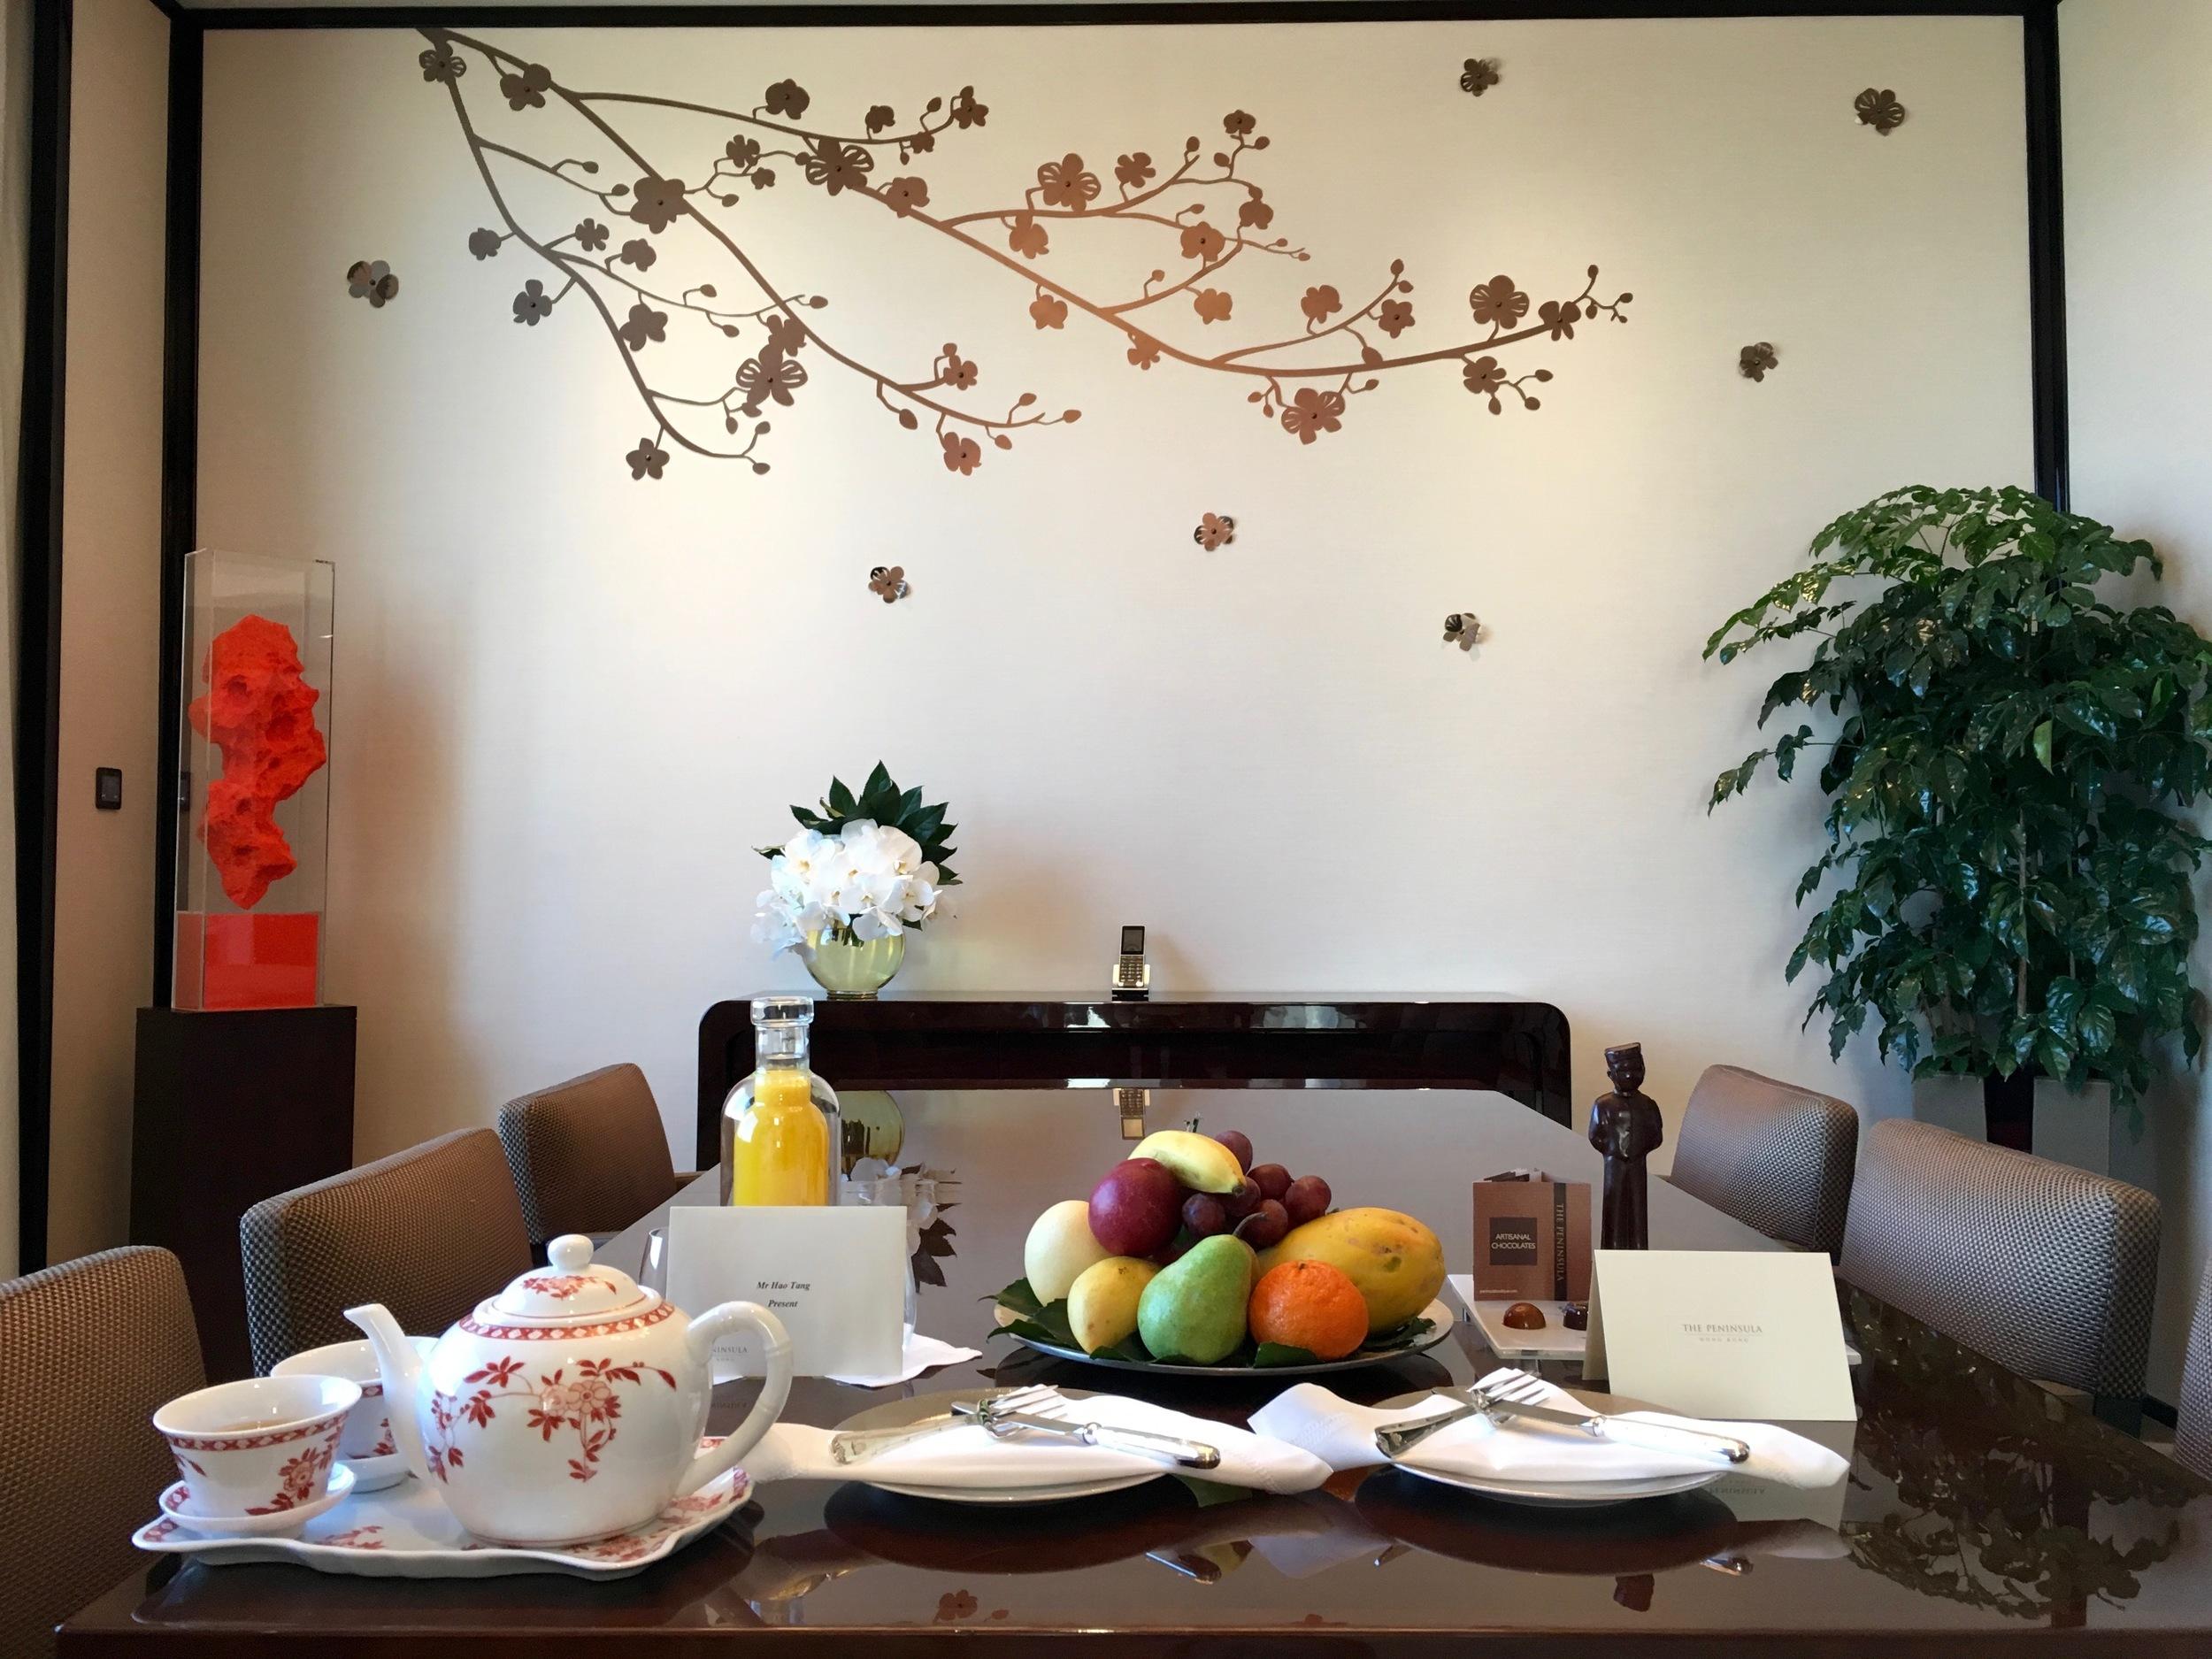 Generous welcome amenities (tea, fruit, juice, truffles and the signature chocolate bellboy).